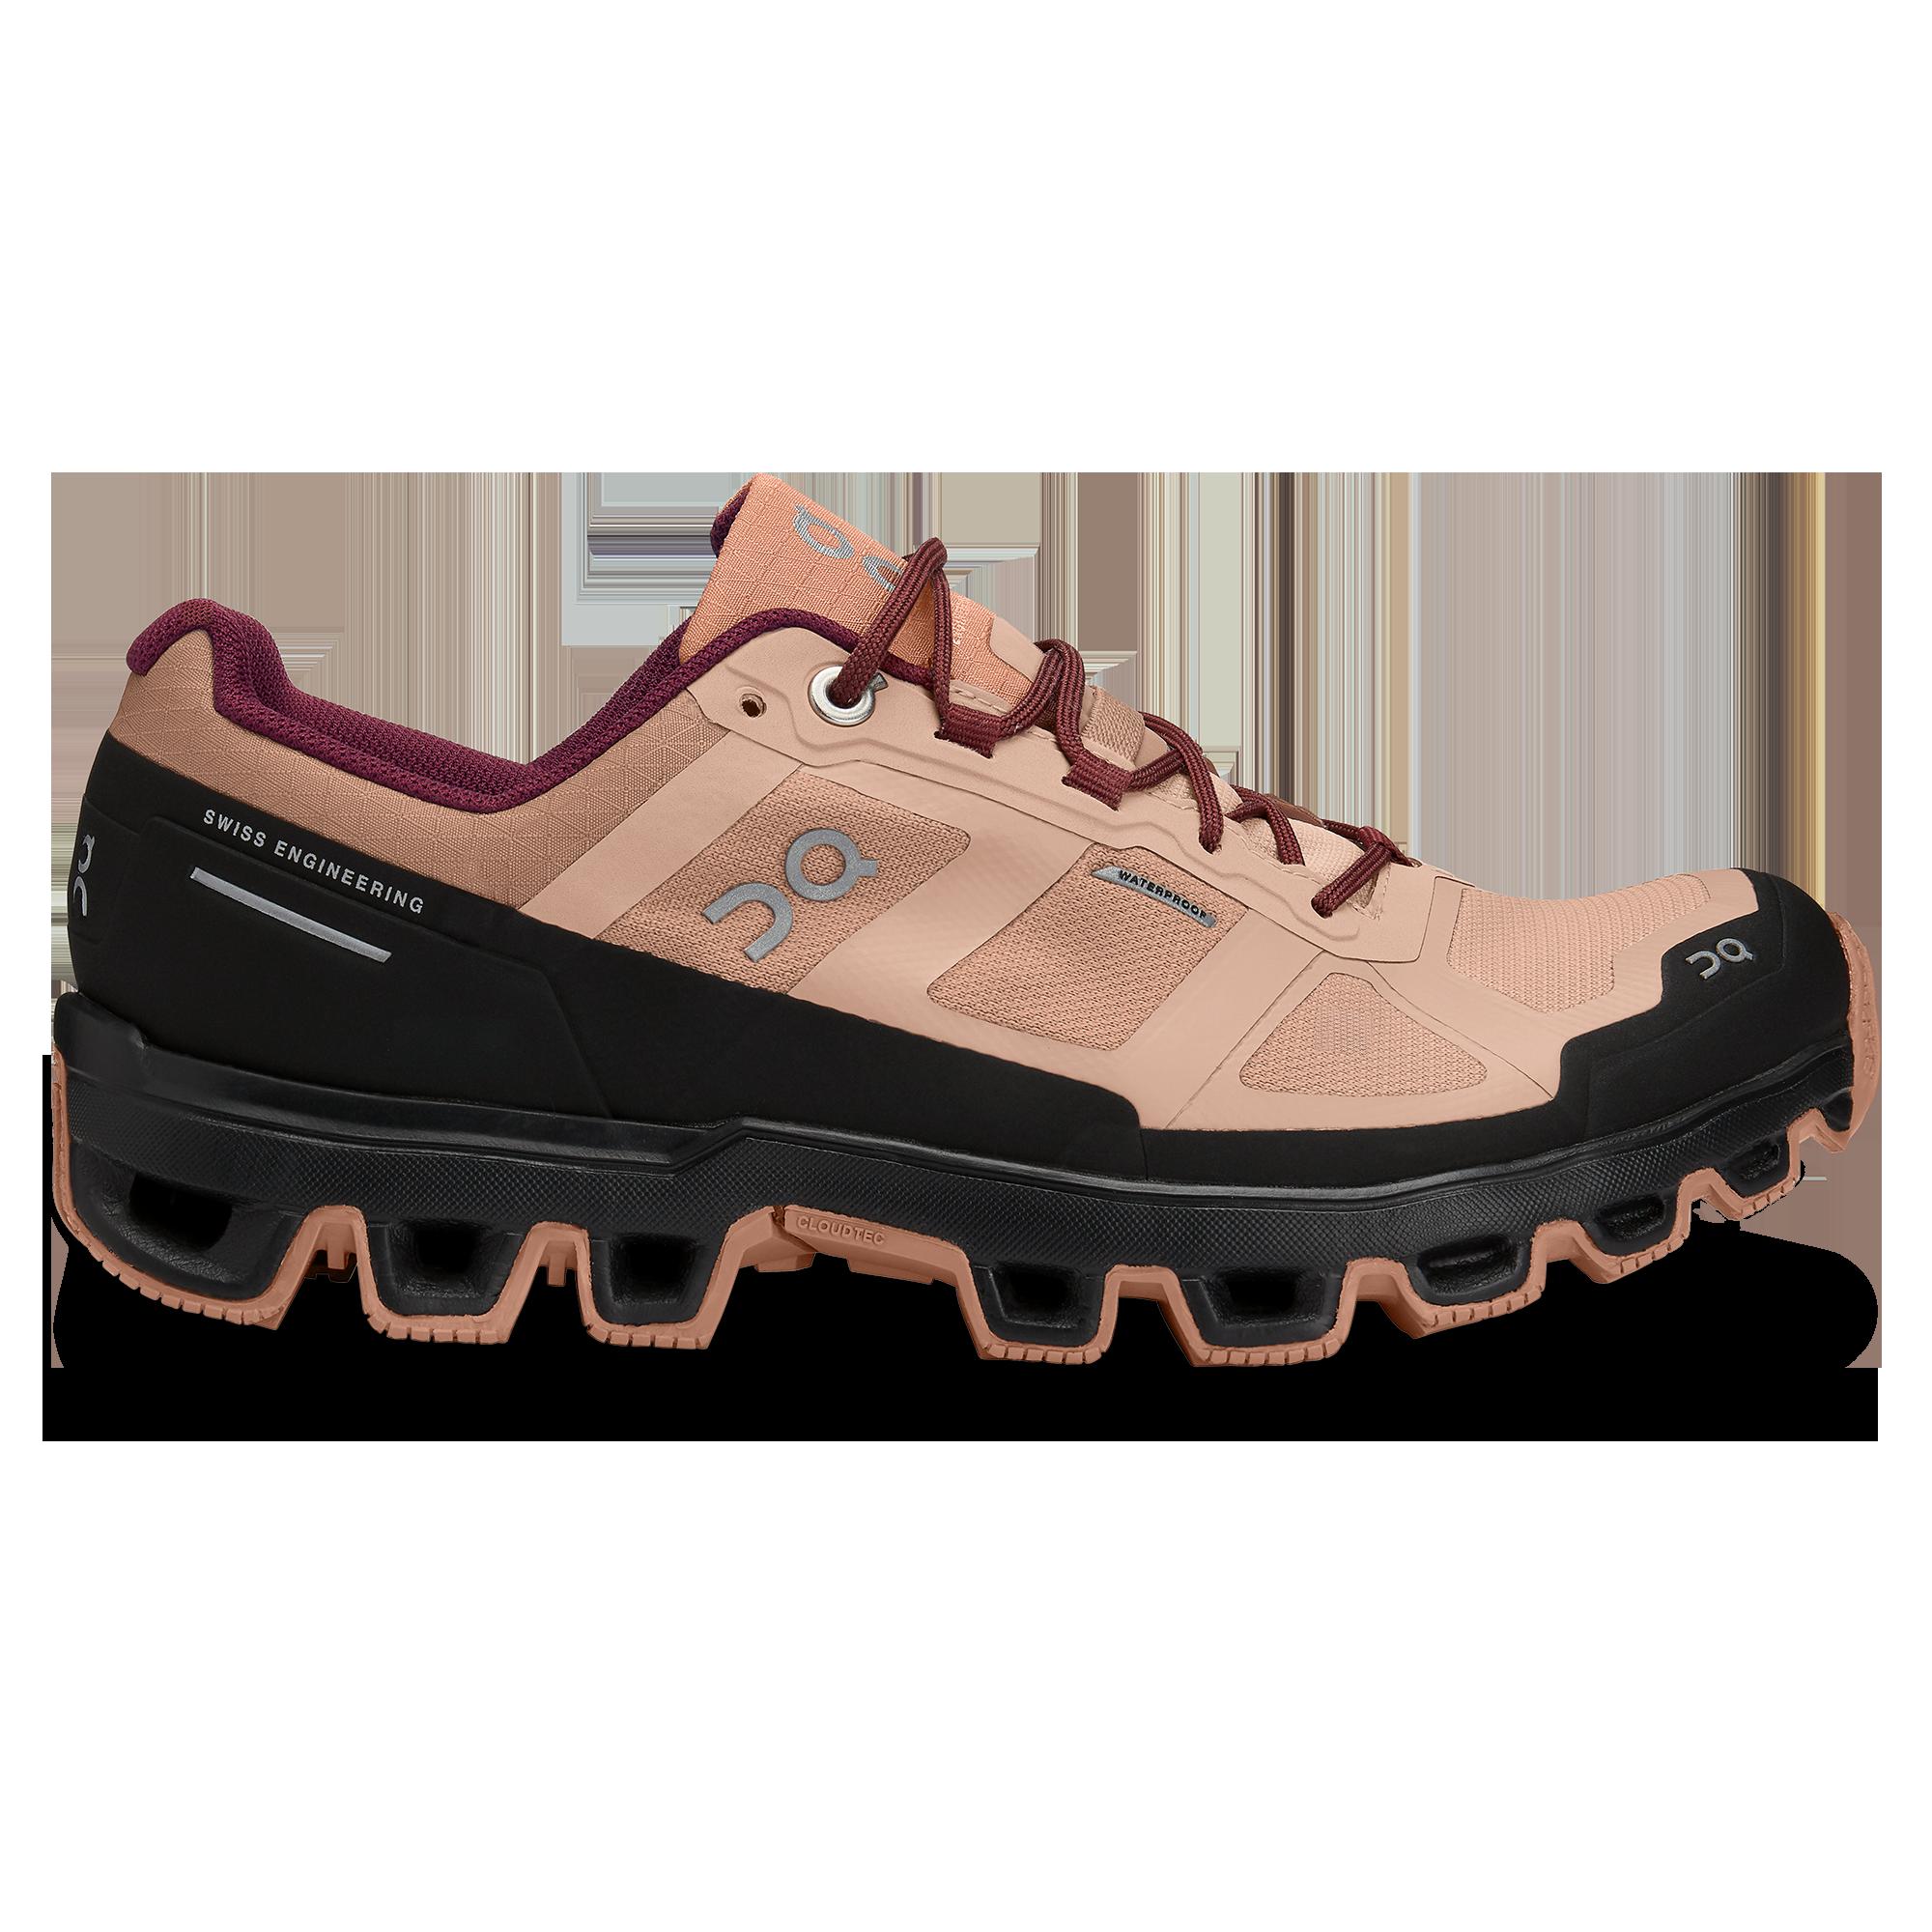 waterproof trail running shoes